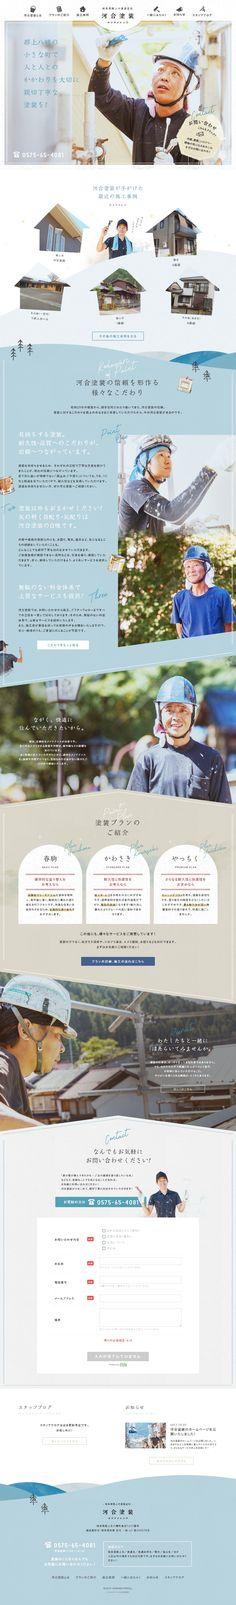 Web Layout, Layout Design, Website Layout, Fashion Website Design, Website Design Inspiration, Web Japan, Enterprise System, Magazin Design, Best Web Design